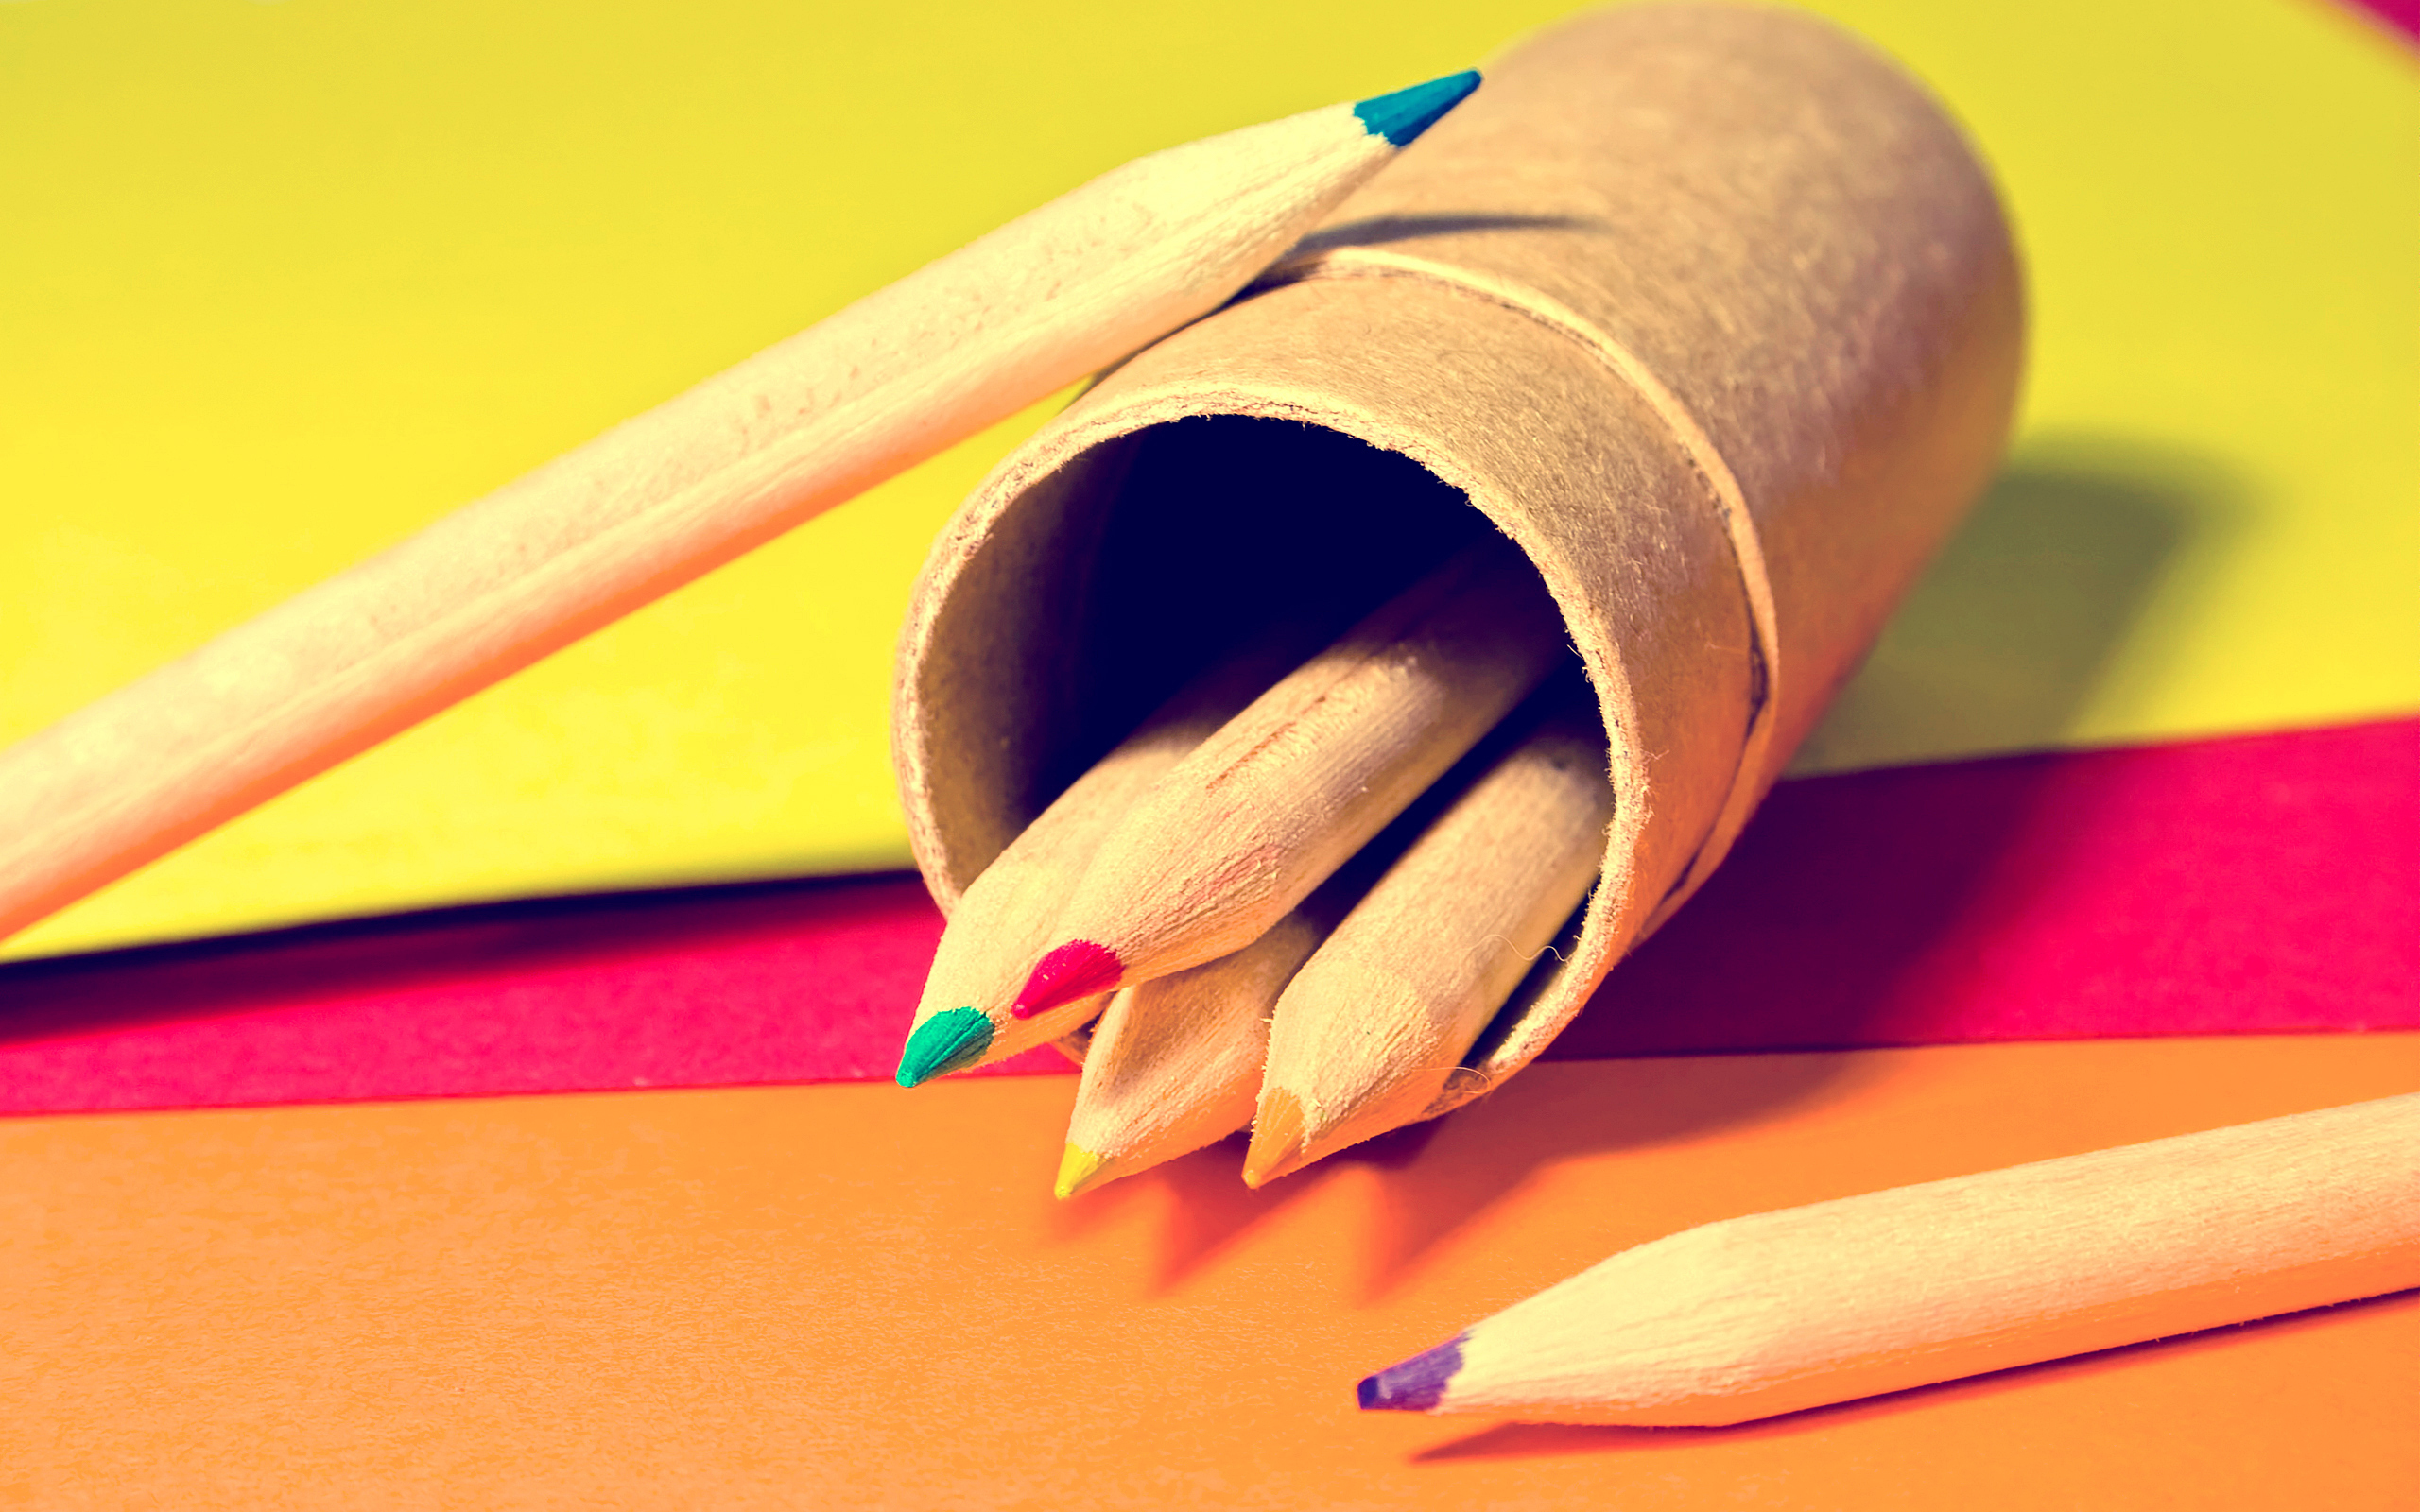 карандаш лист буквы загрузить